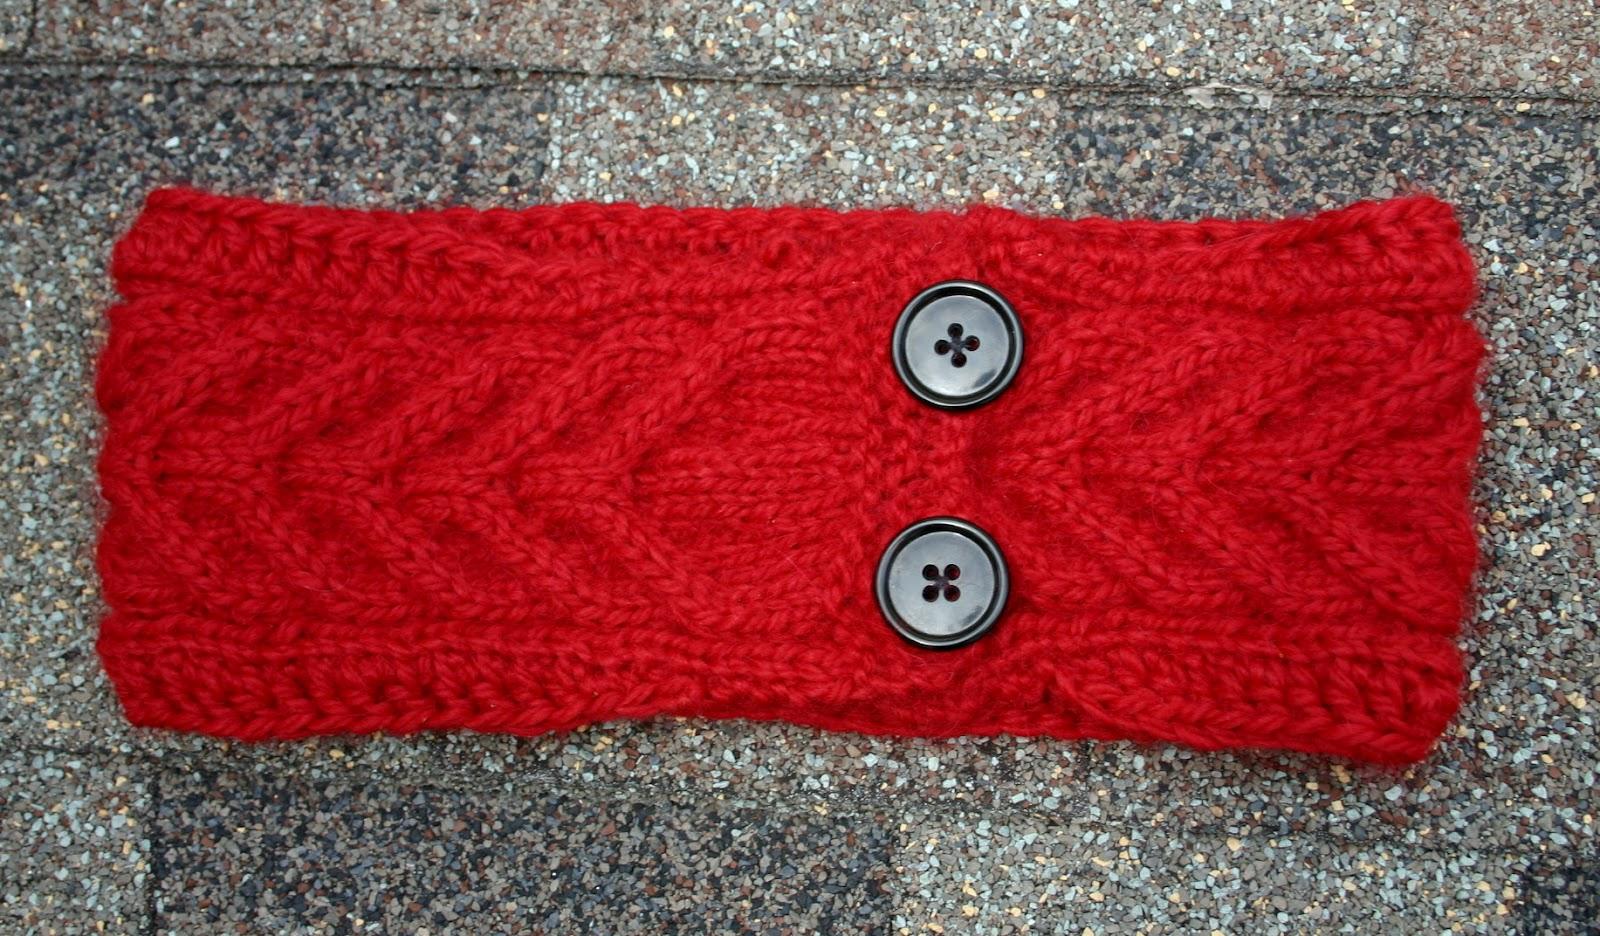 10 Knit Headband Patterns With Button The Funky Stitch